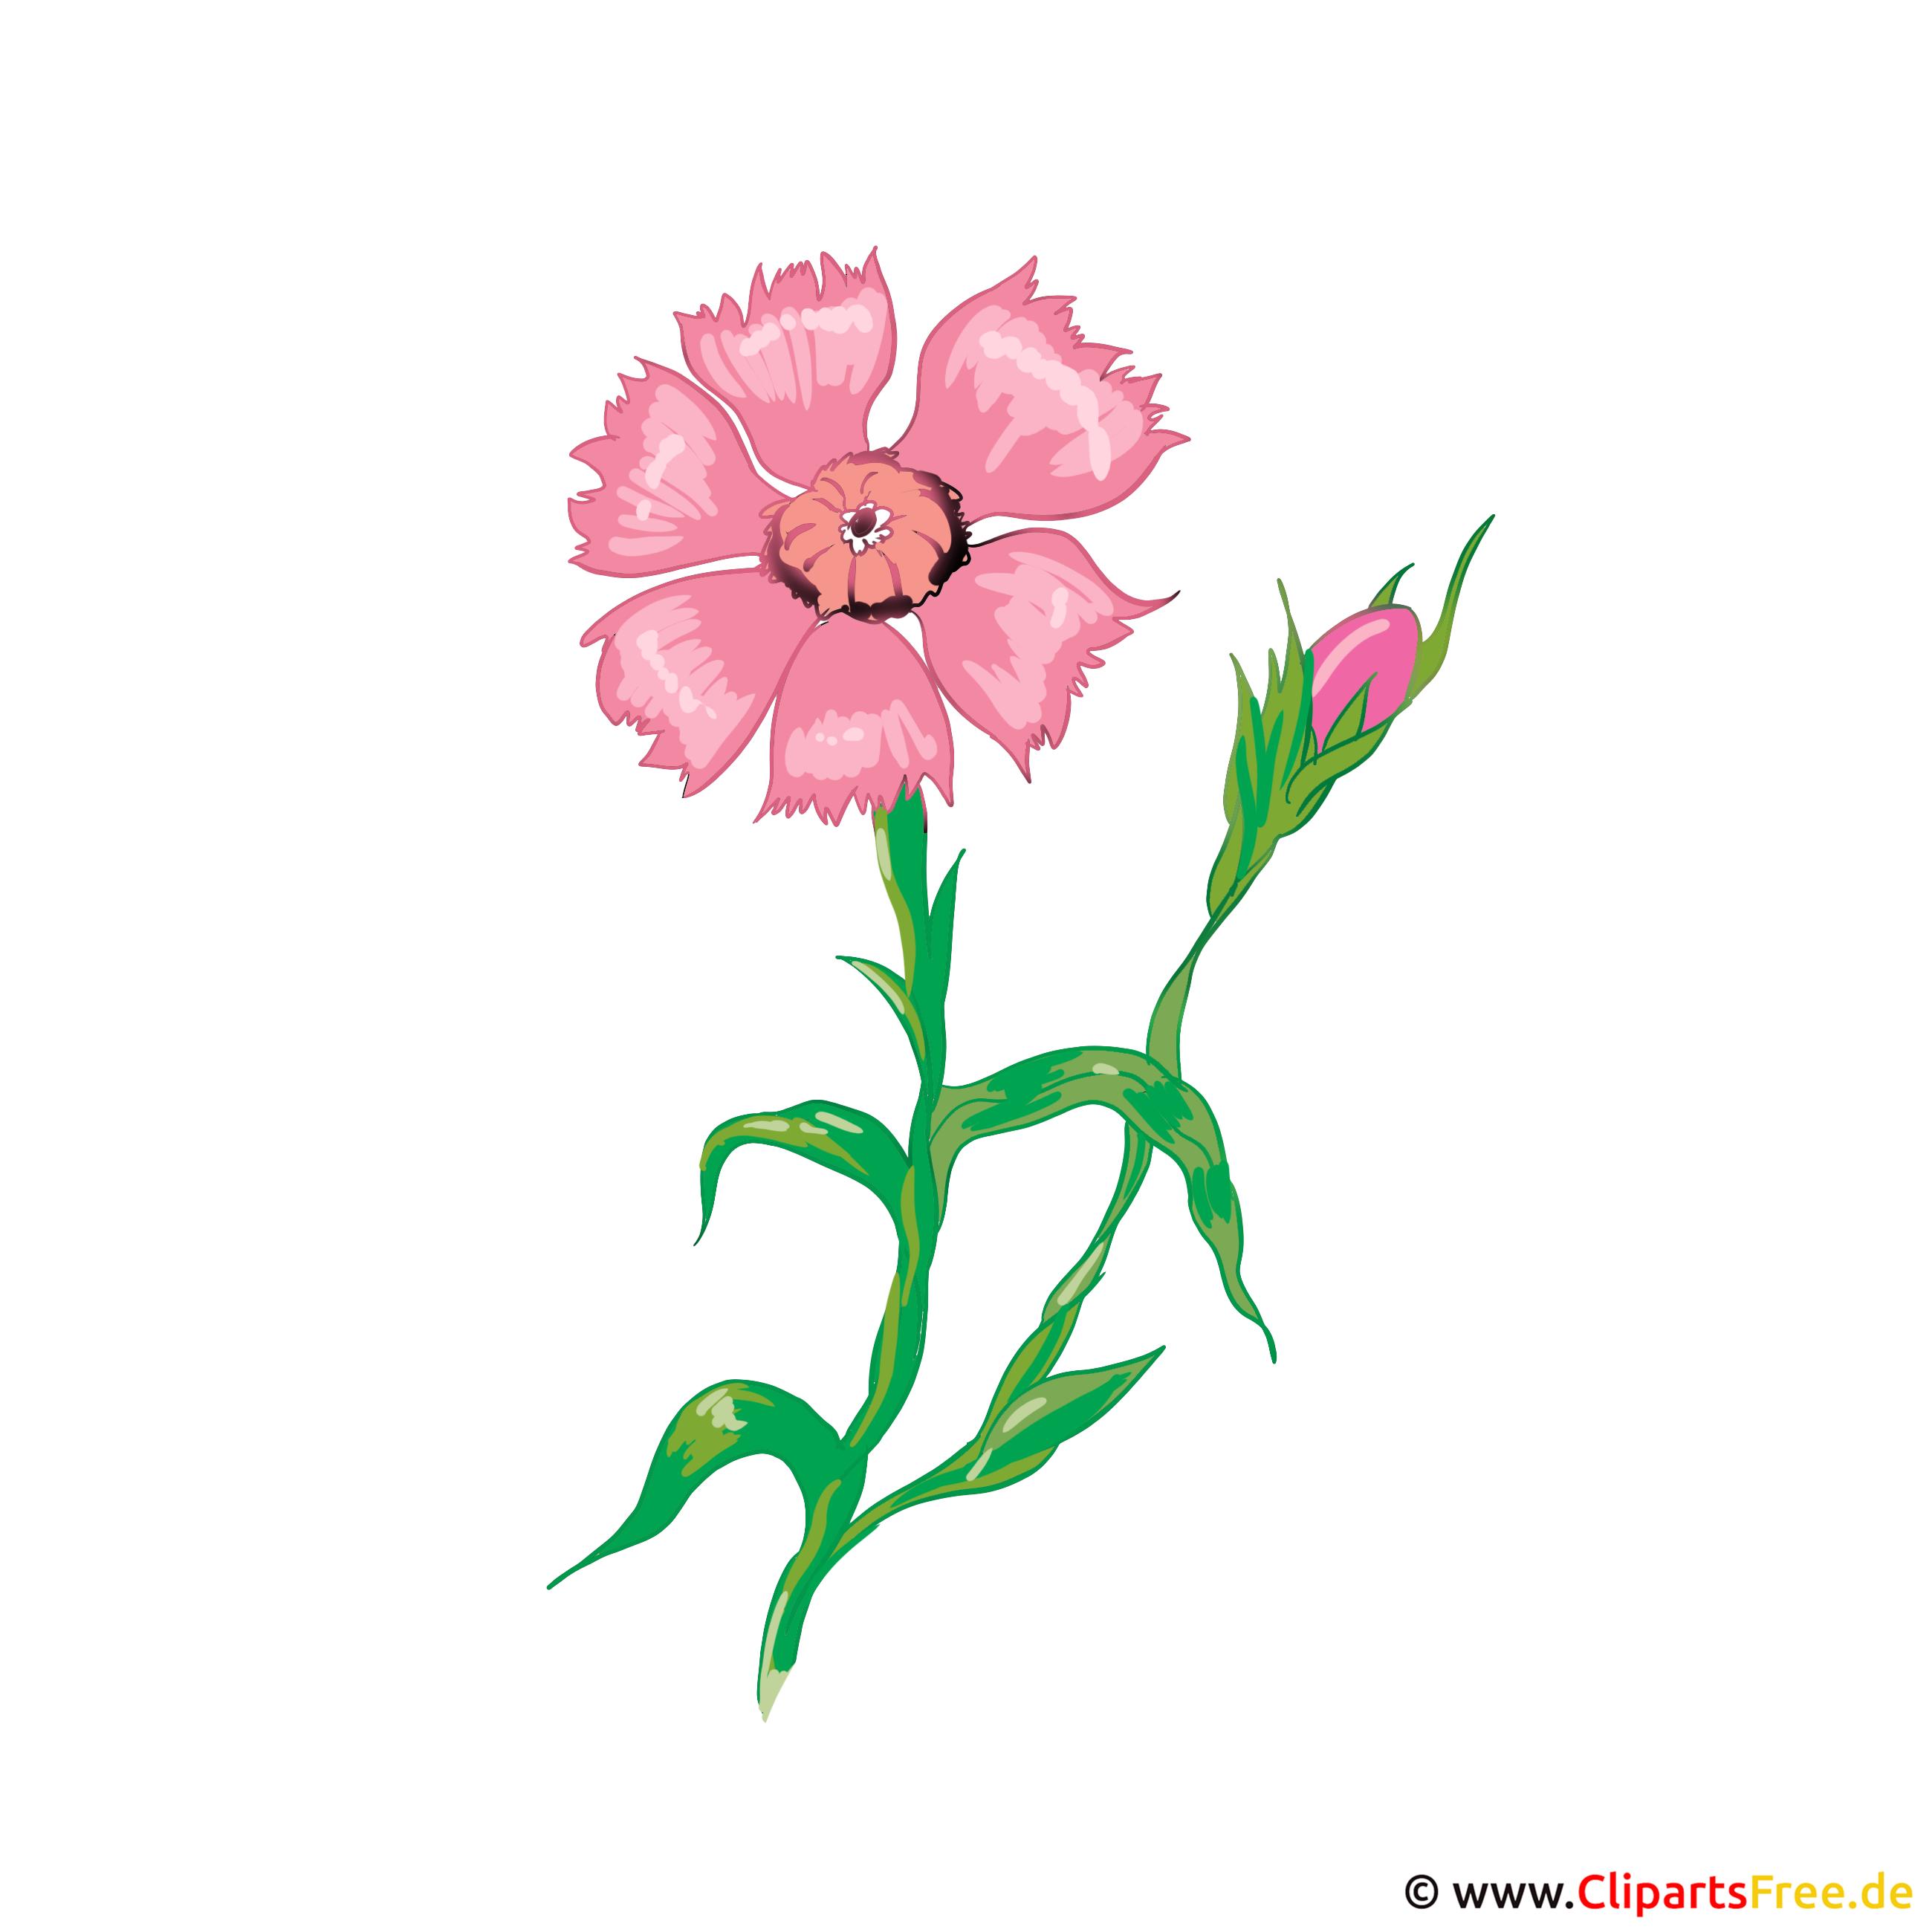 Blume Zyane Bild, Illustration, Karte